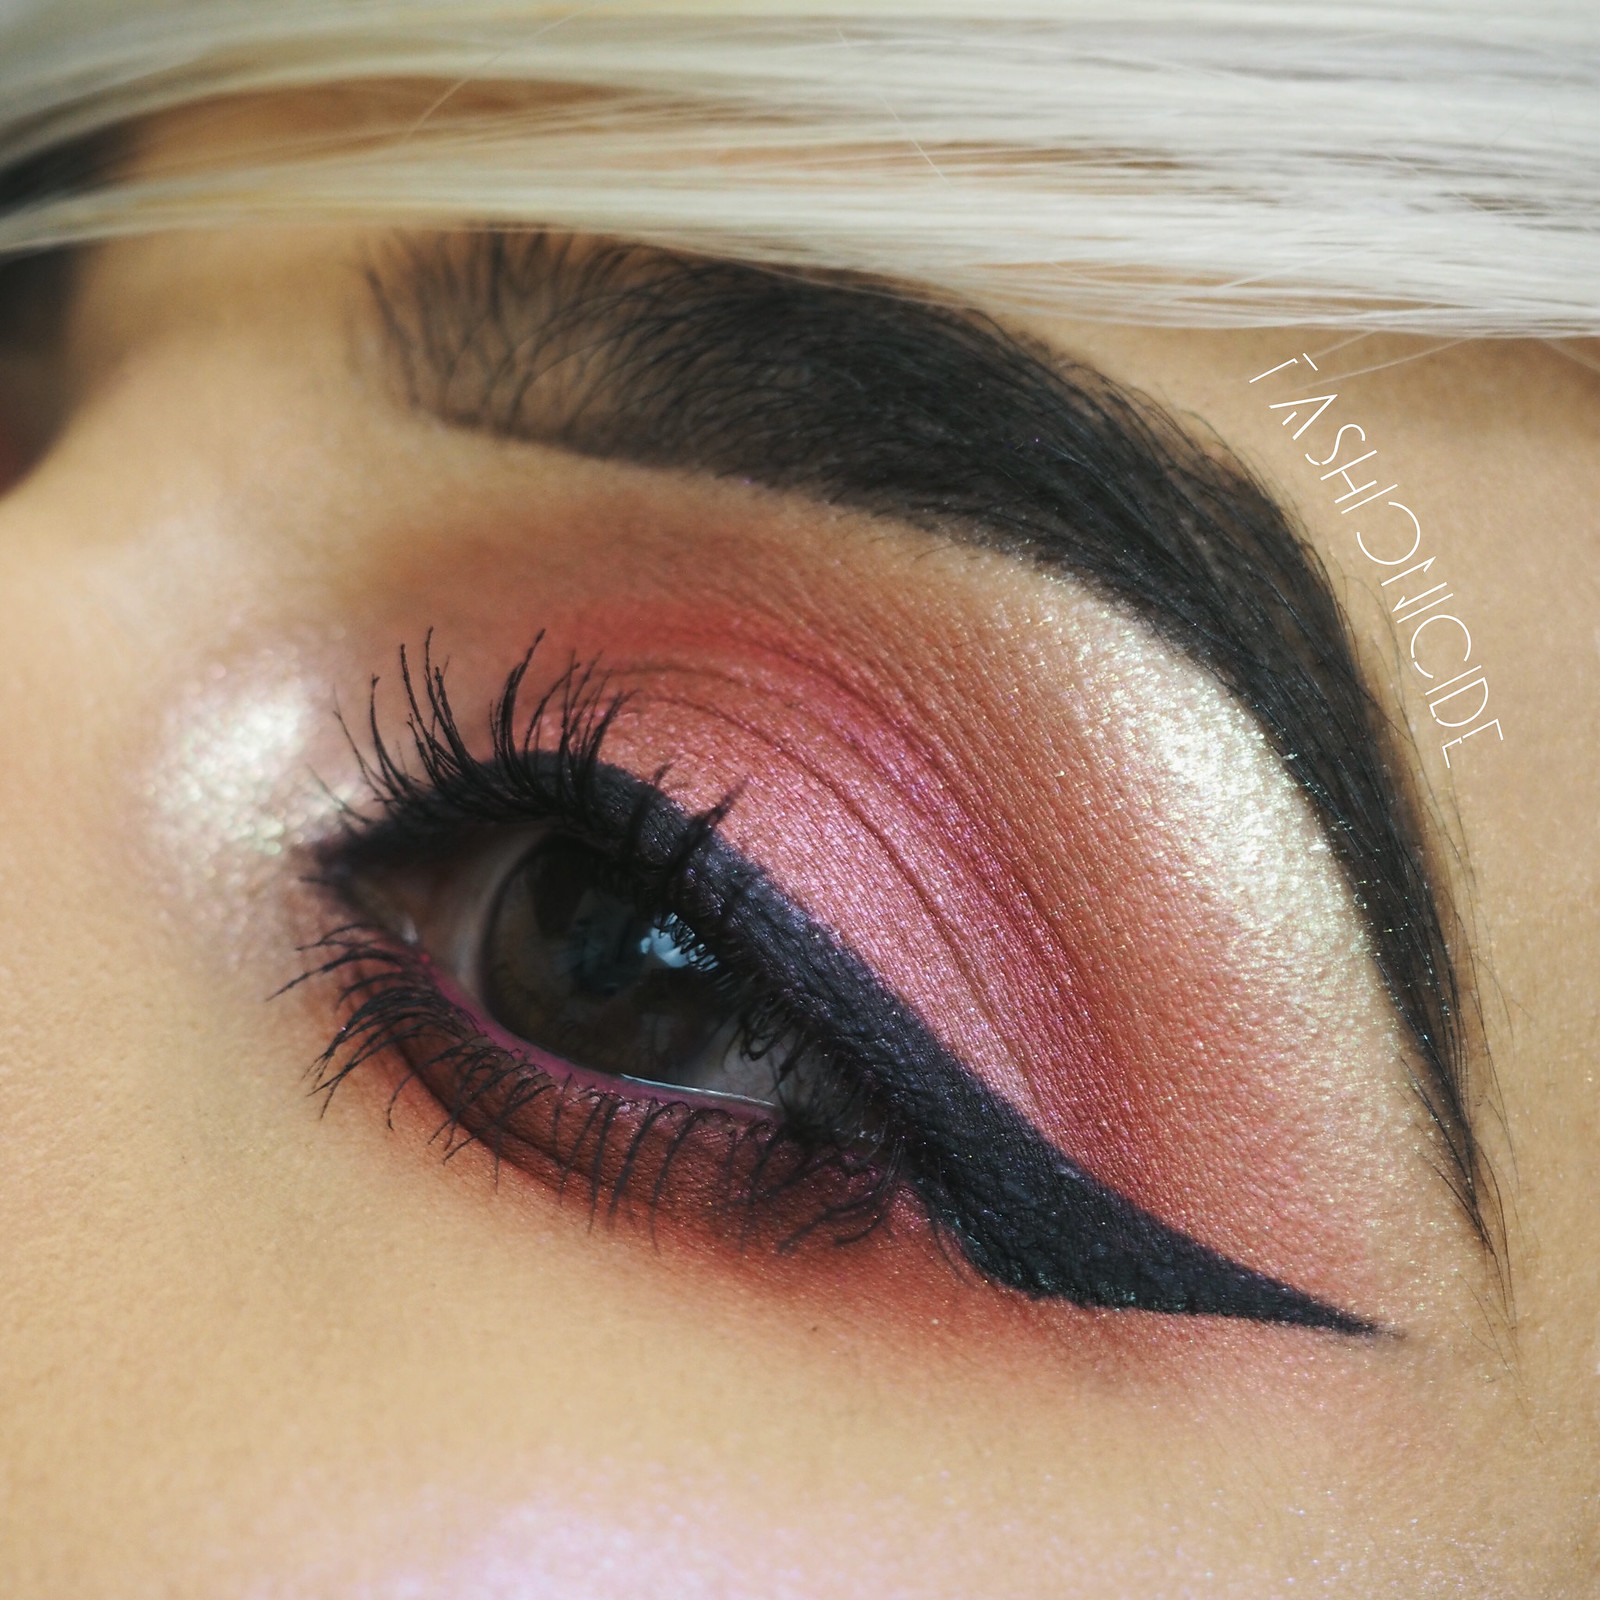 KIKO-Smart-Colour-Burgundy-Metallic-Red-Eyeshadow-16